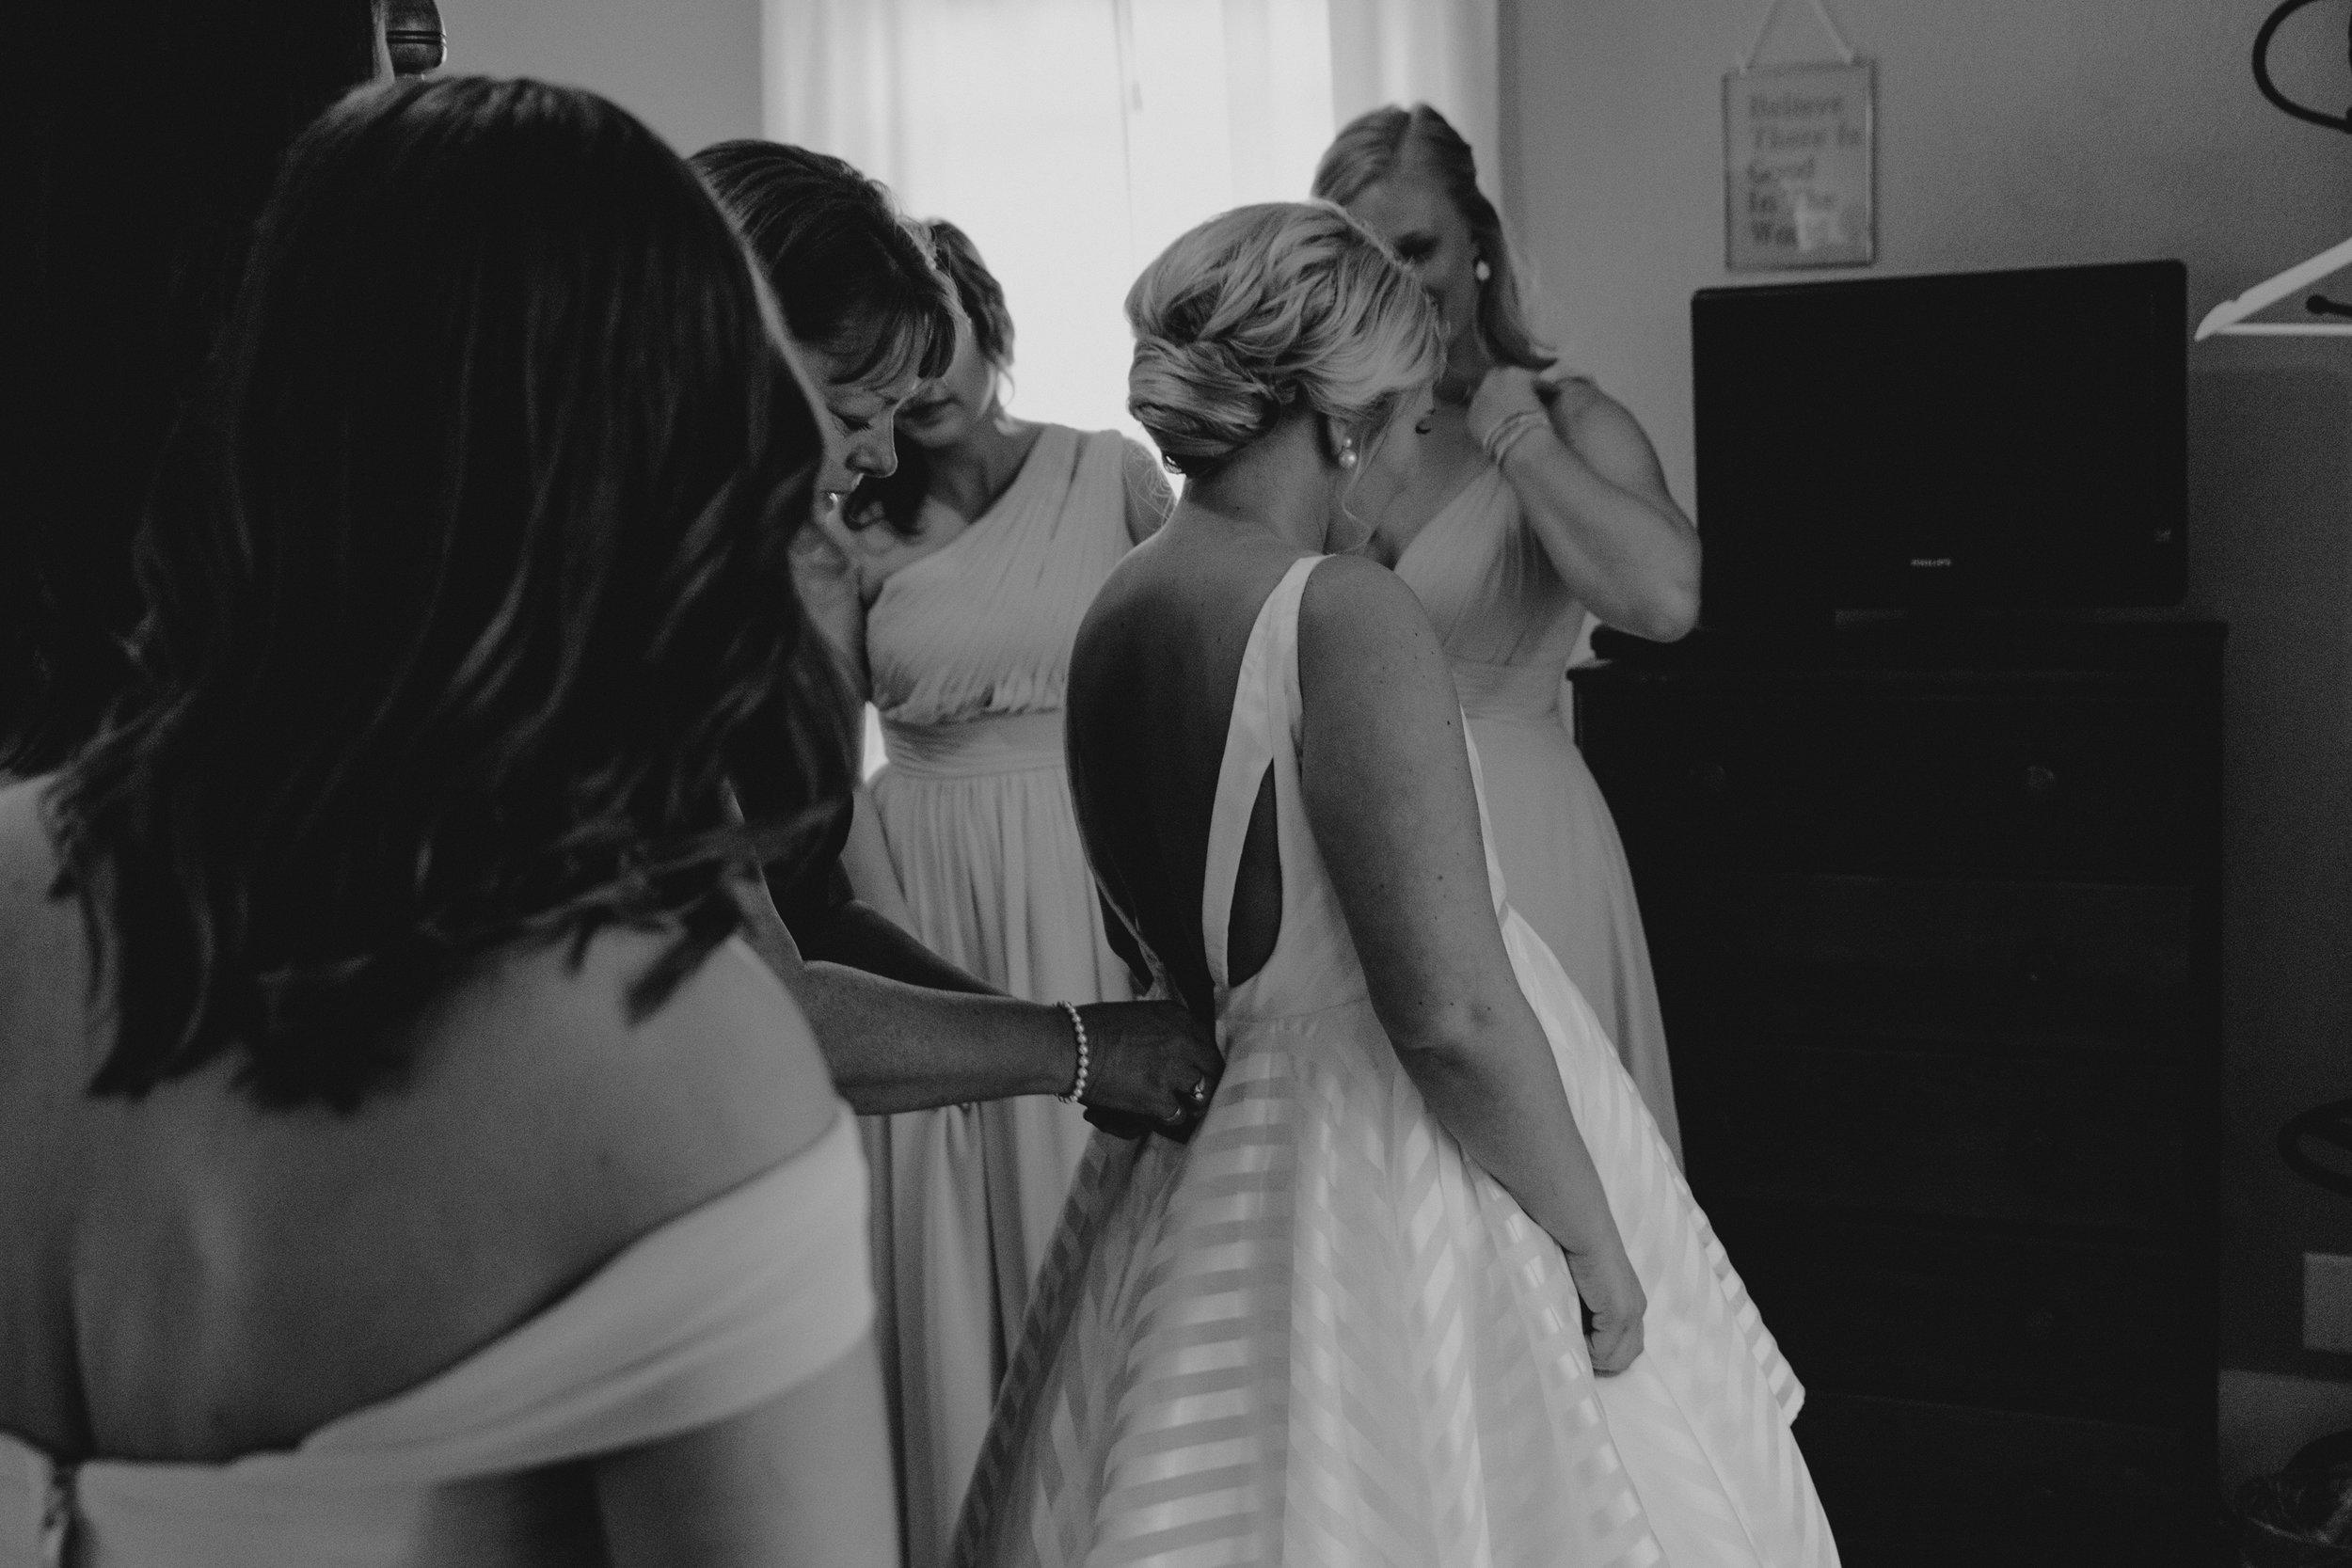 WeddingvideographersSanDiego.jpg